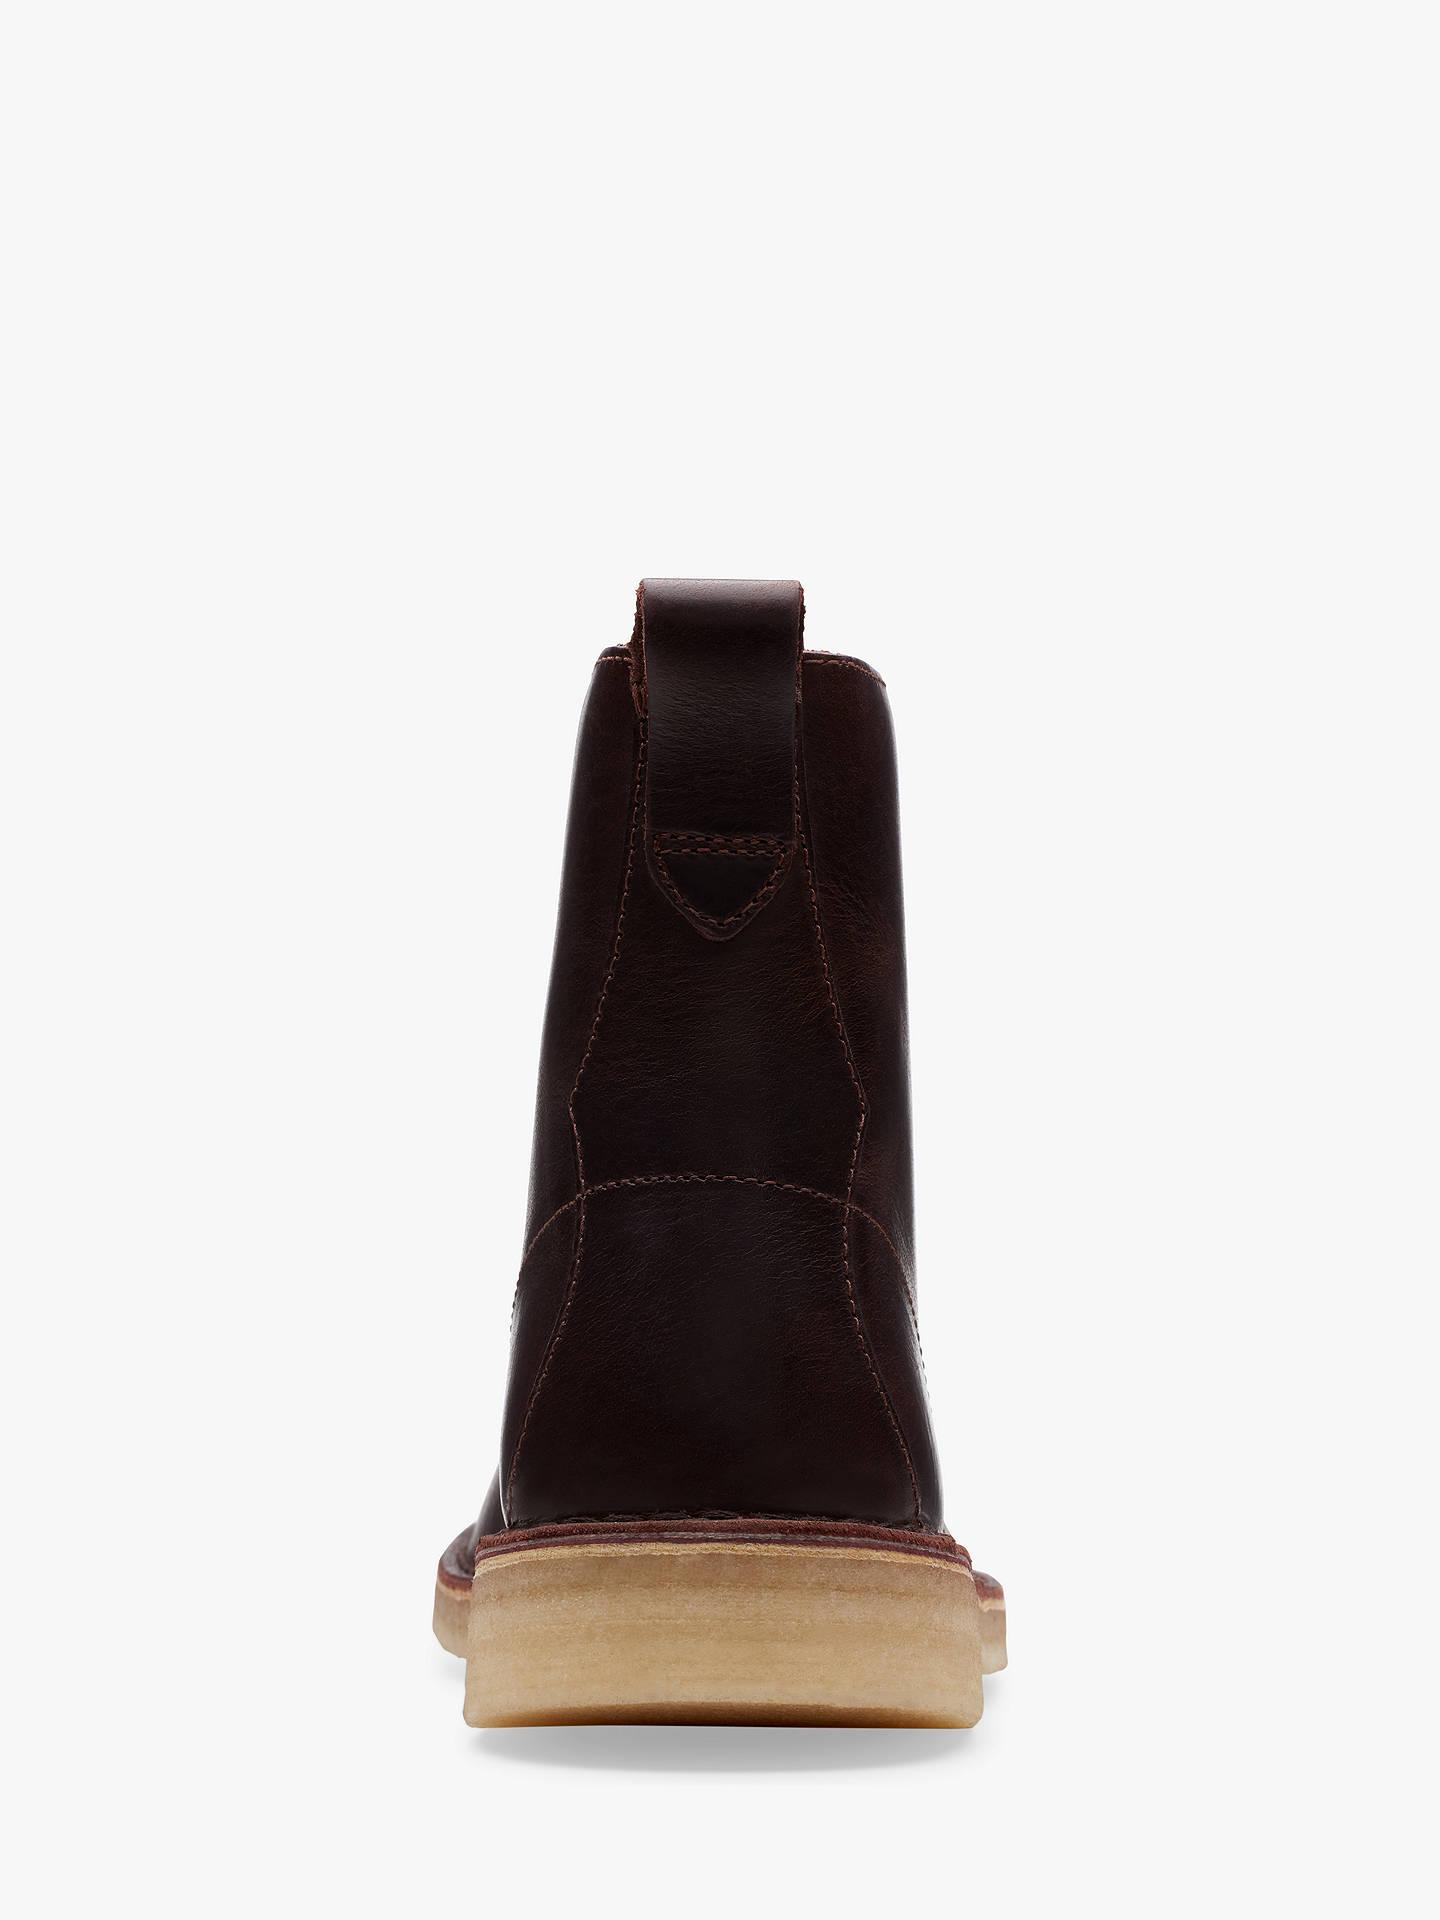 53112e070e2 Clarks Originals Desert Mali Leather Boots at John Lewis & Partners